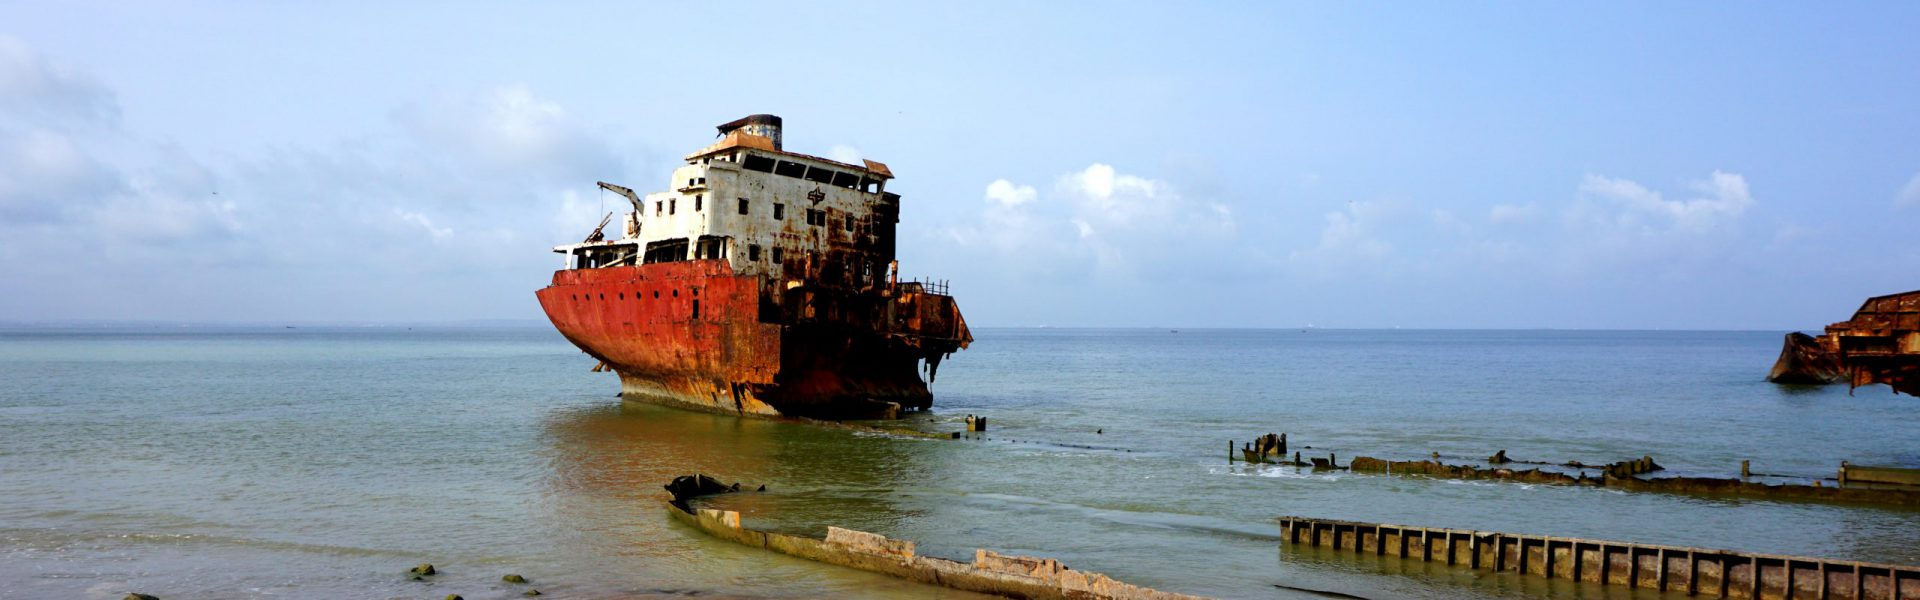 Shipwreck Beach in Angola